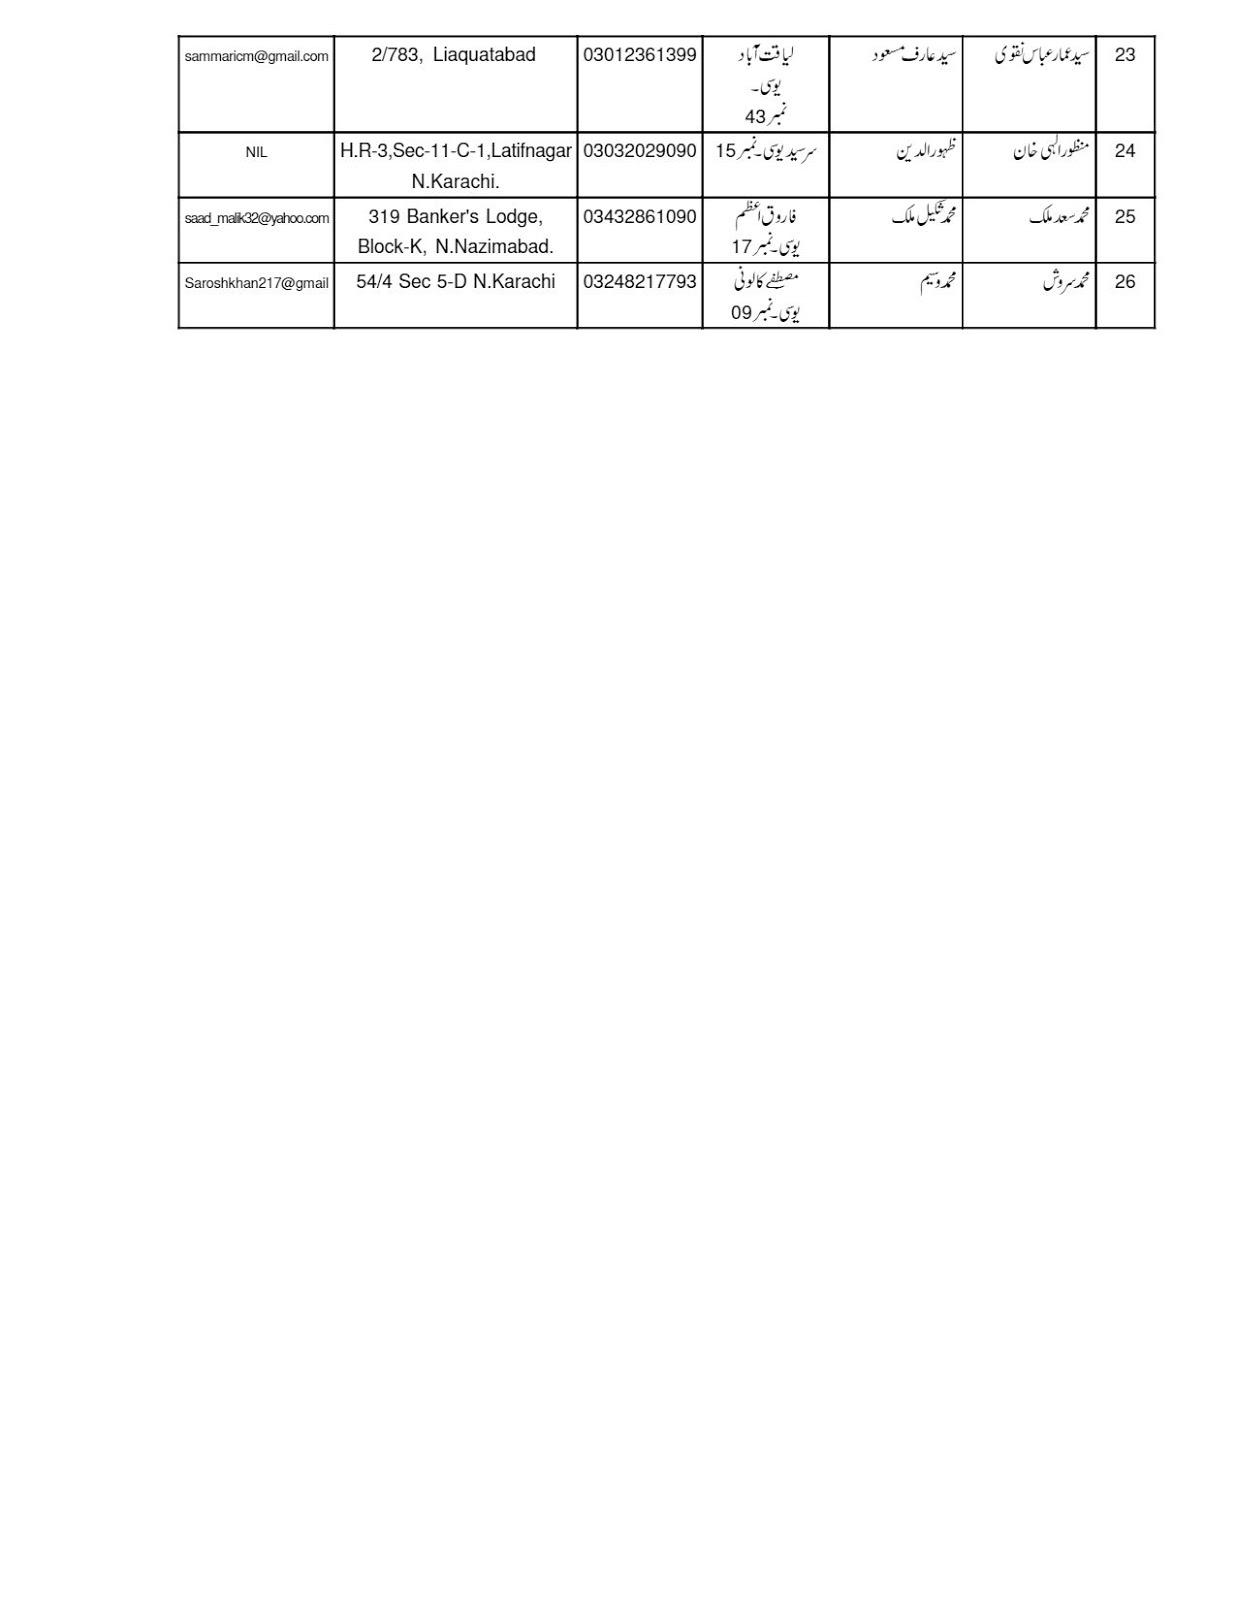 District Municipal Corporation Central Karachi: UC Chairman / Vice